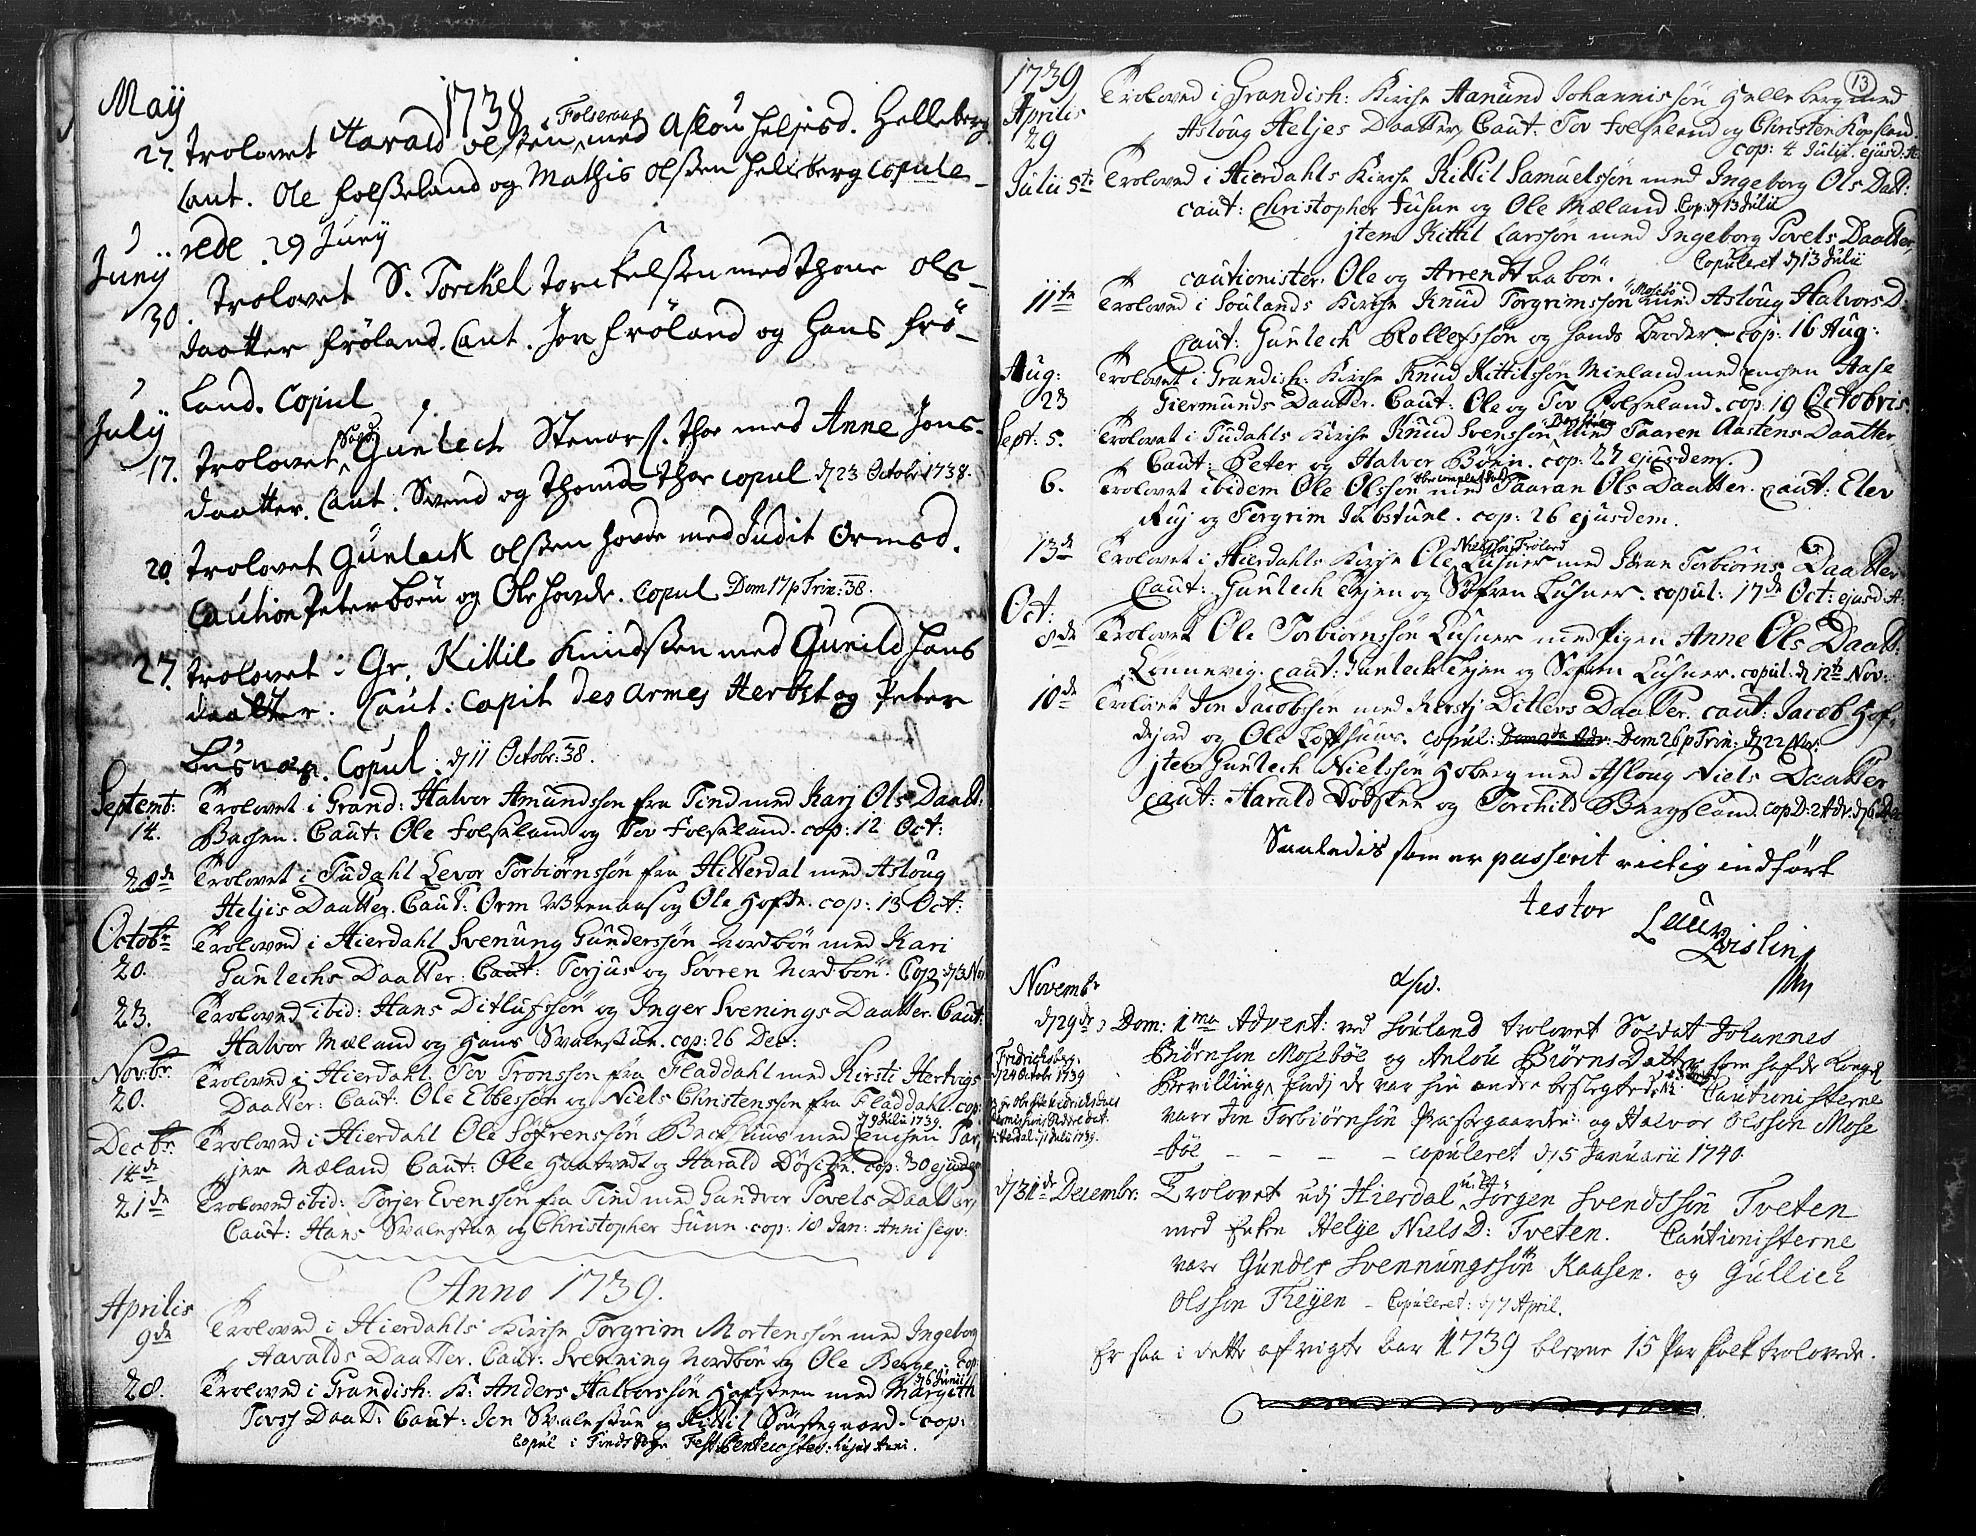 SAKO, Hjartdal kirkebøker, F/Fa/L0004: Ministerialbok nr. I 4, 1727-1795, s. 13